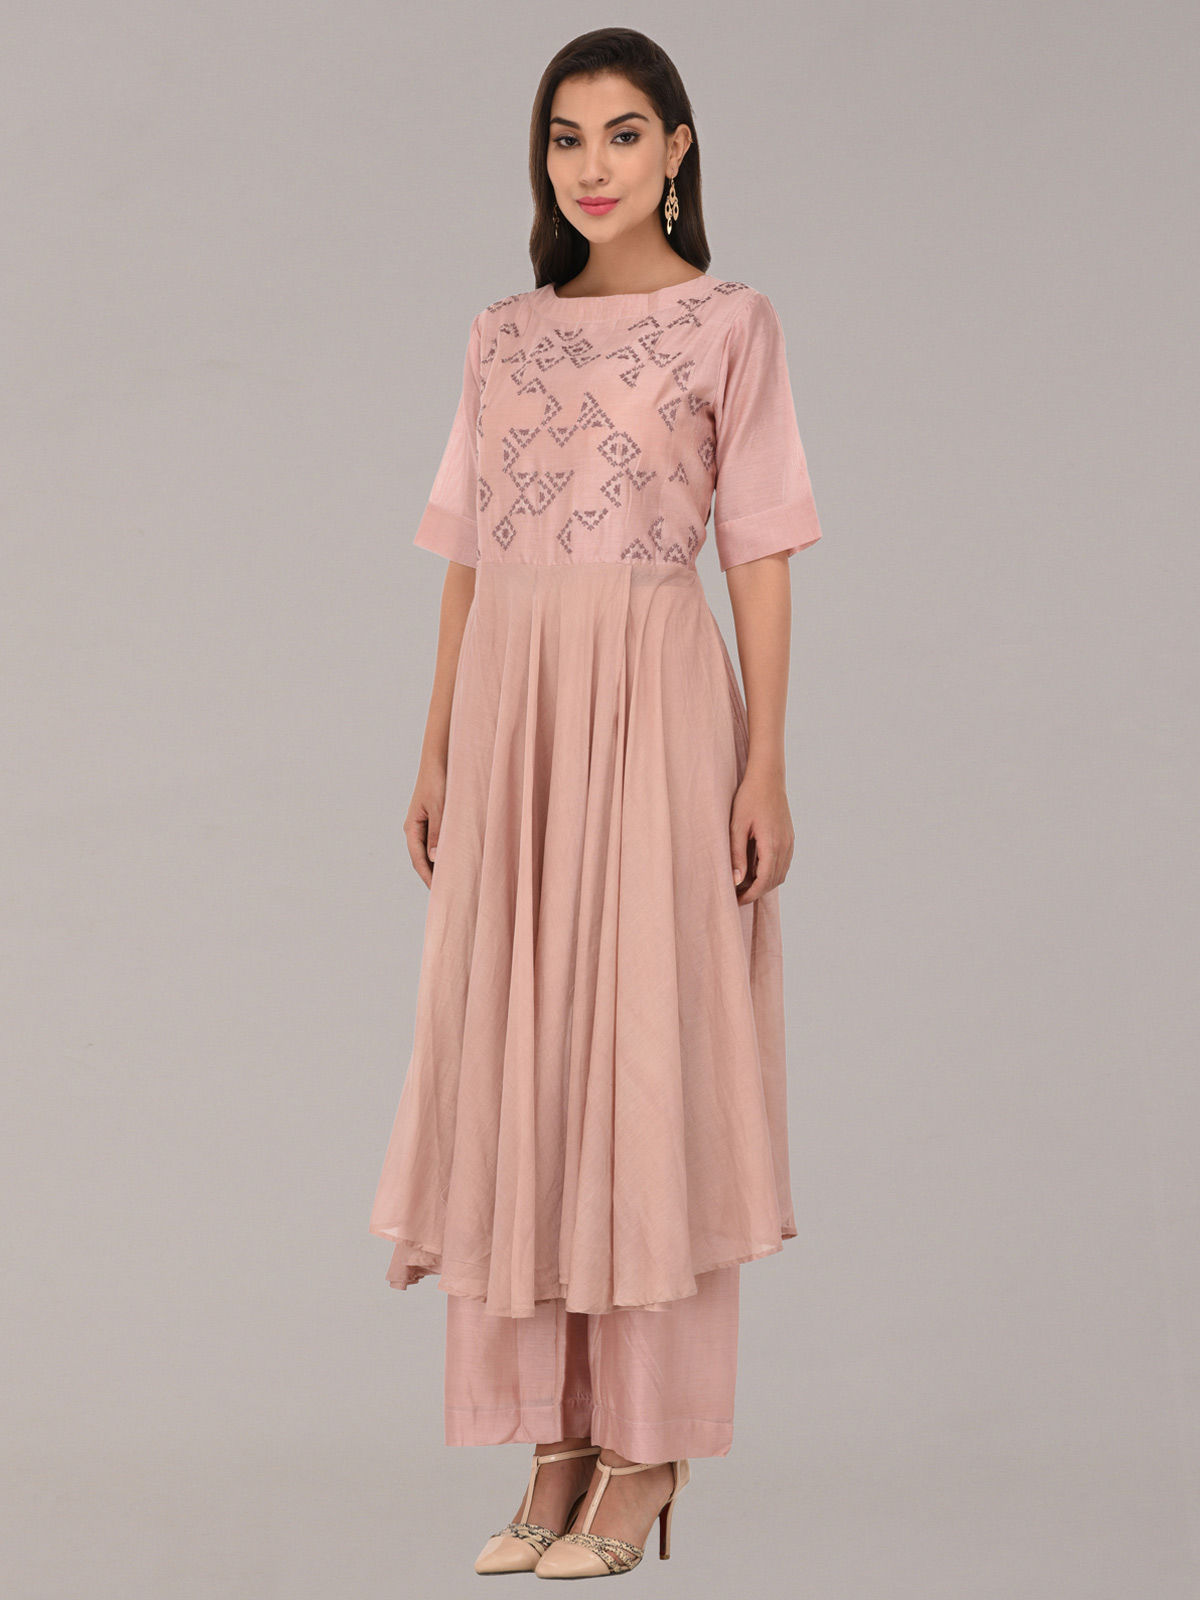 Embroided peach chanderi silk tunic with bottom